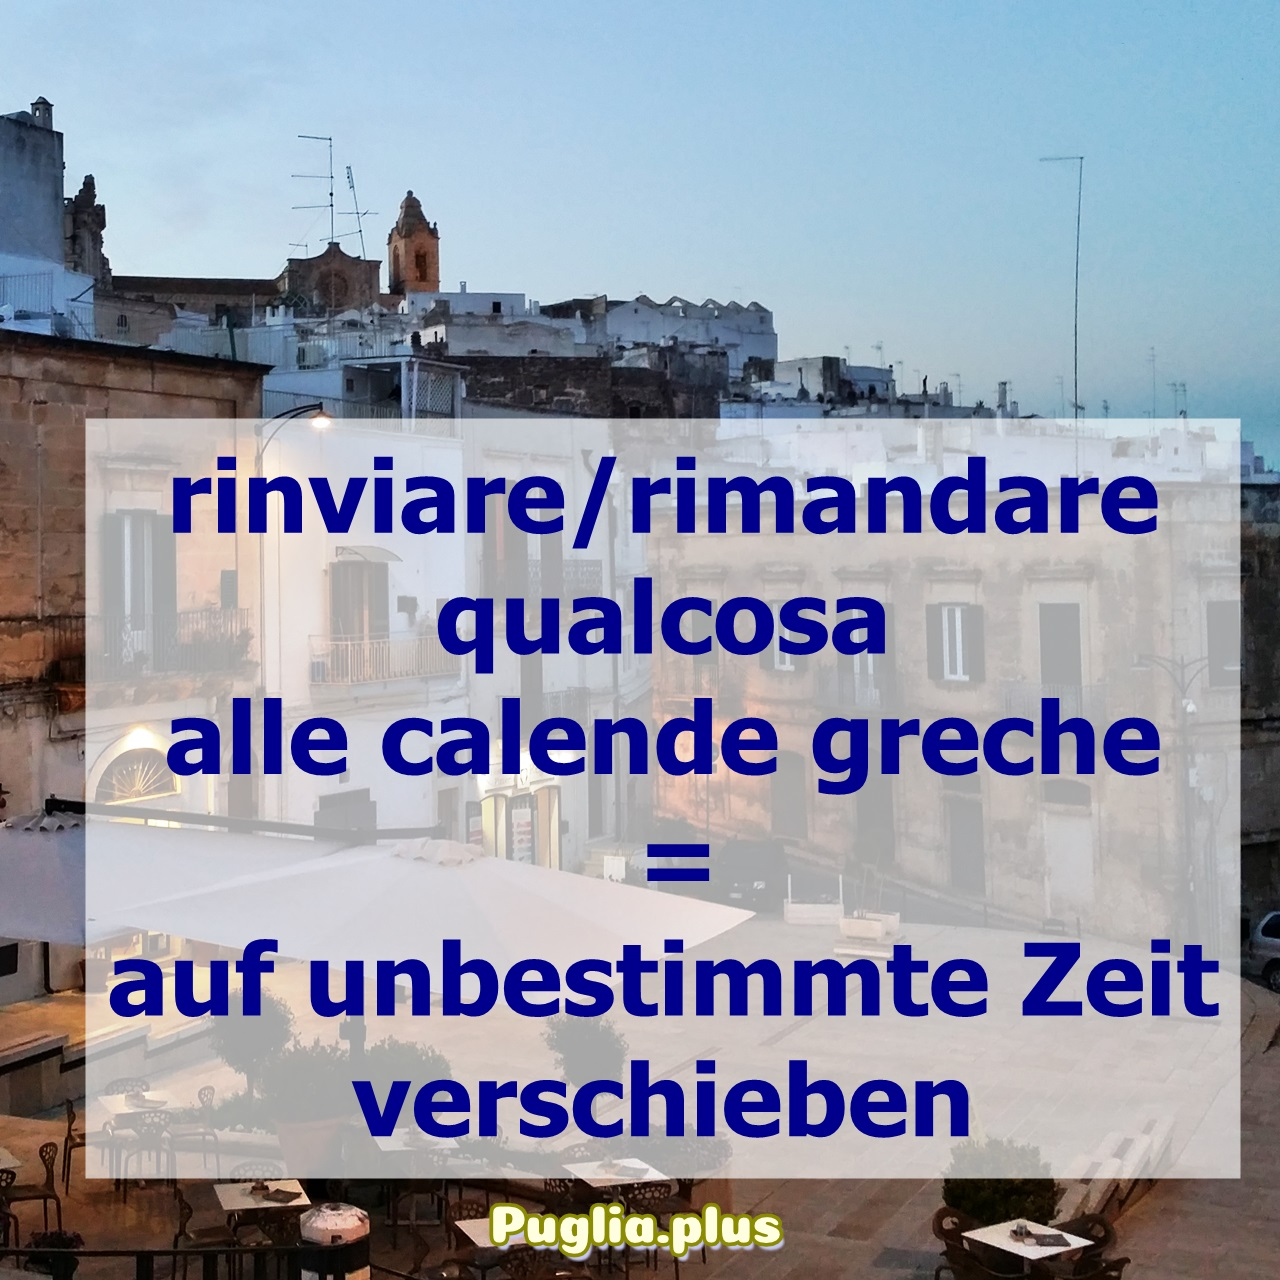 italienische Redewendung verschieben lange Bank, Sankt Nimmerleinstag